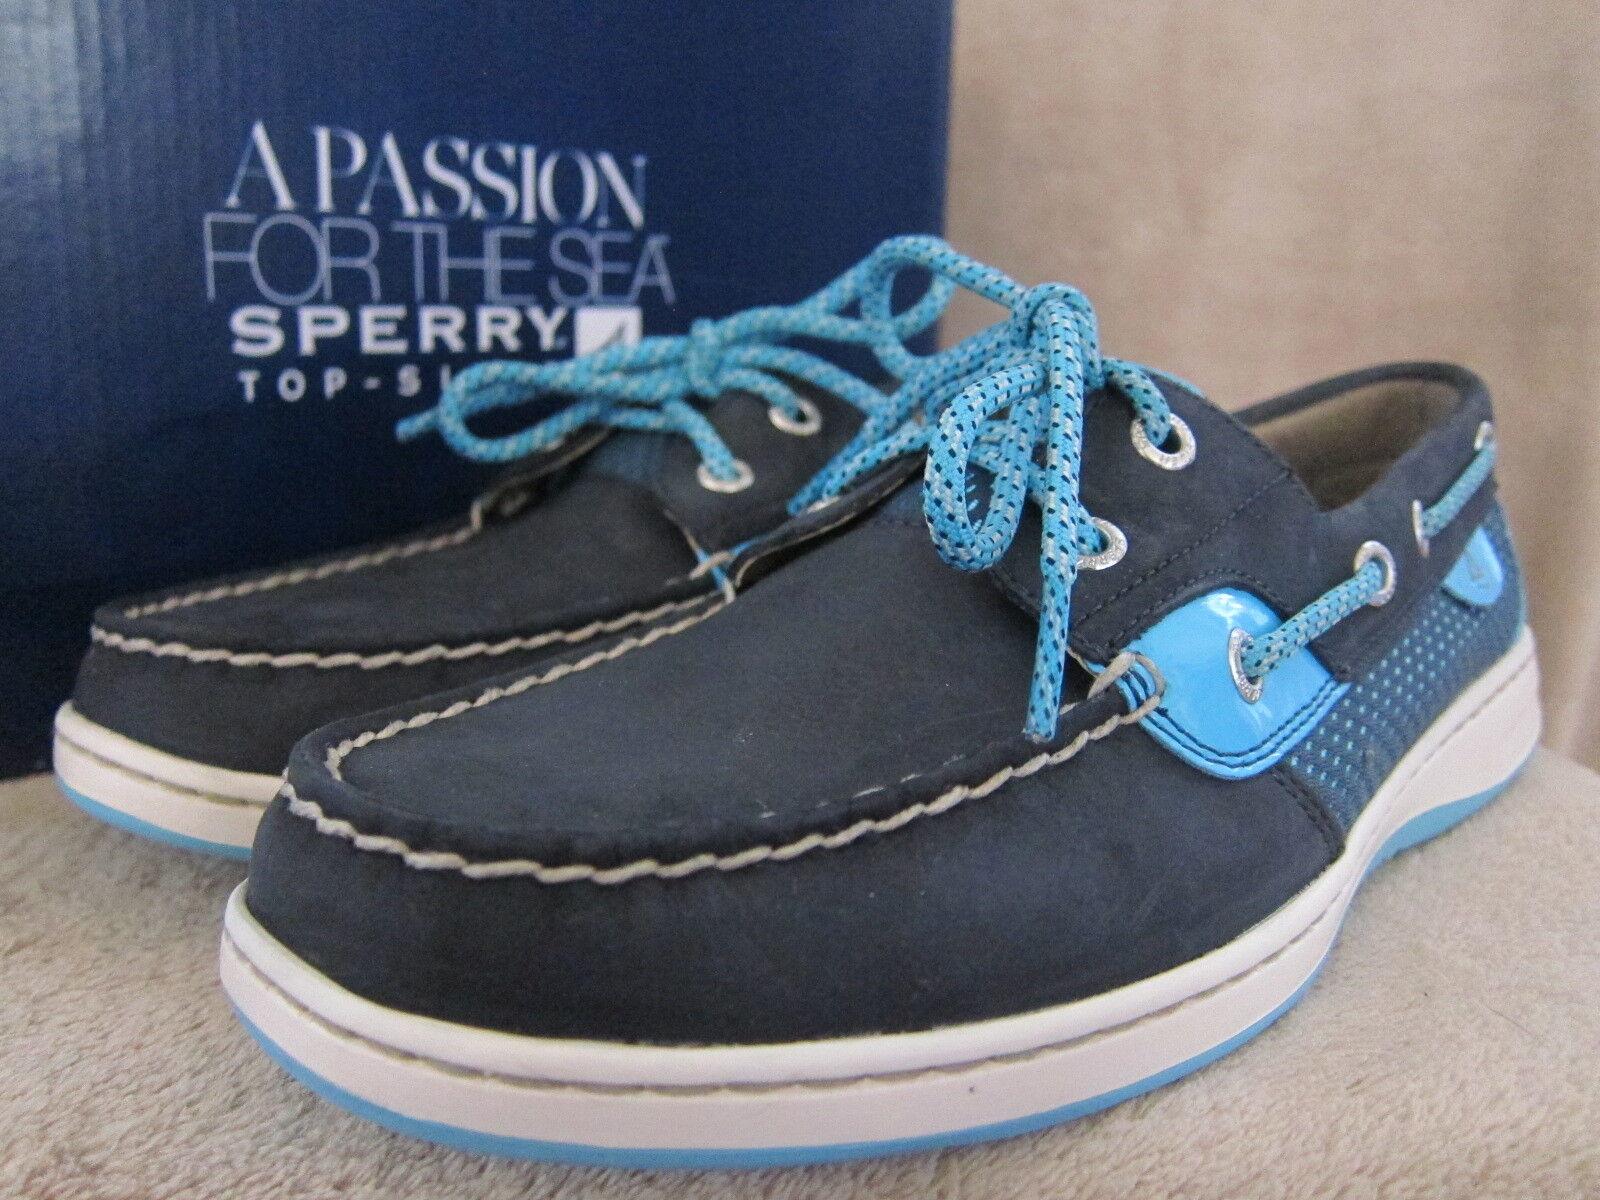 SPERRY Top Sider Bluefish Navy & Turquoise 39 Loafer Loafer Loafer Boat Scarpe US ... 832c76